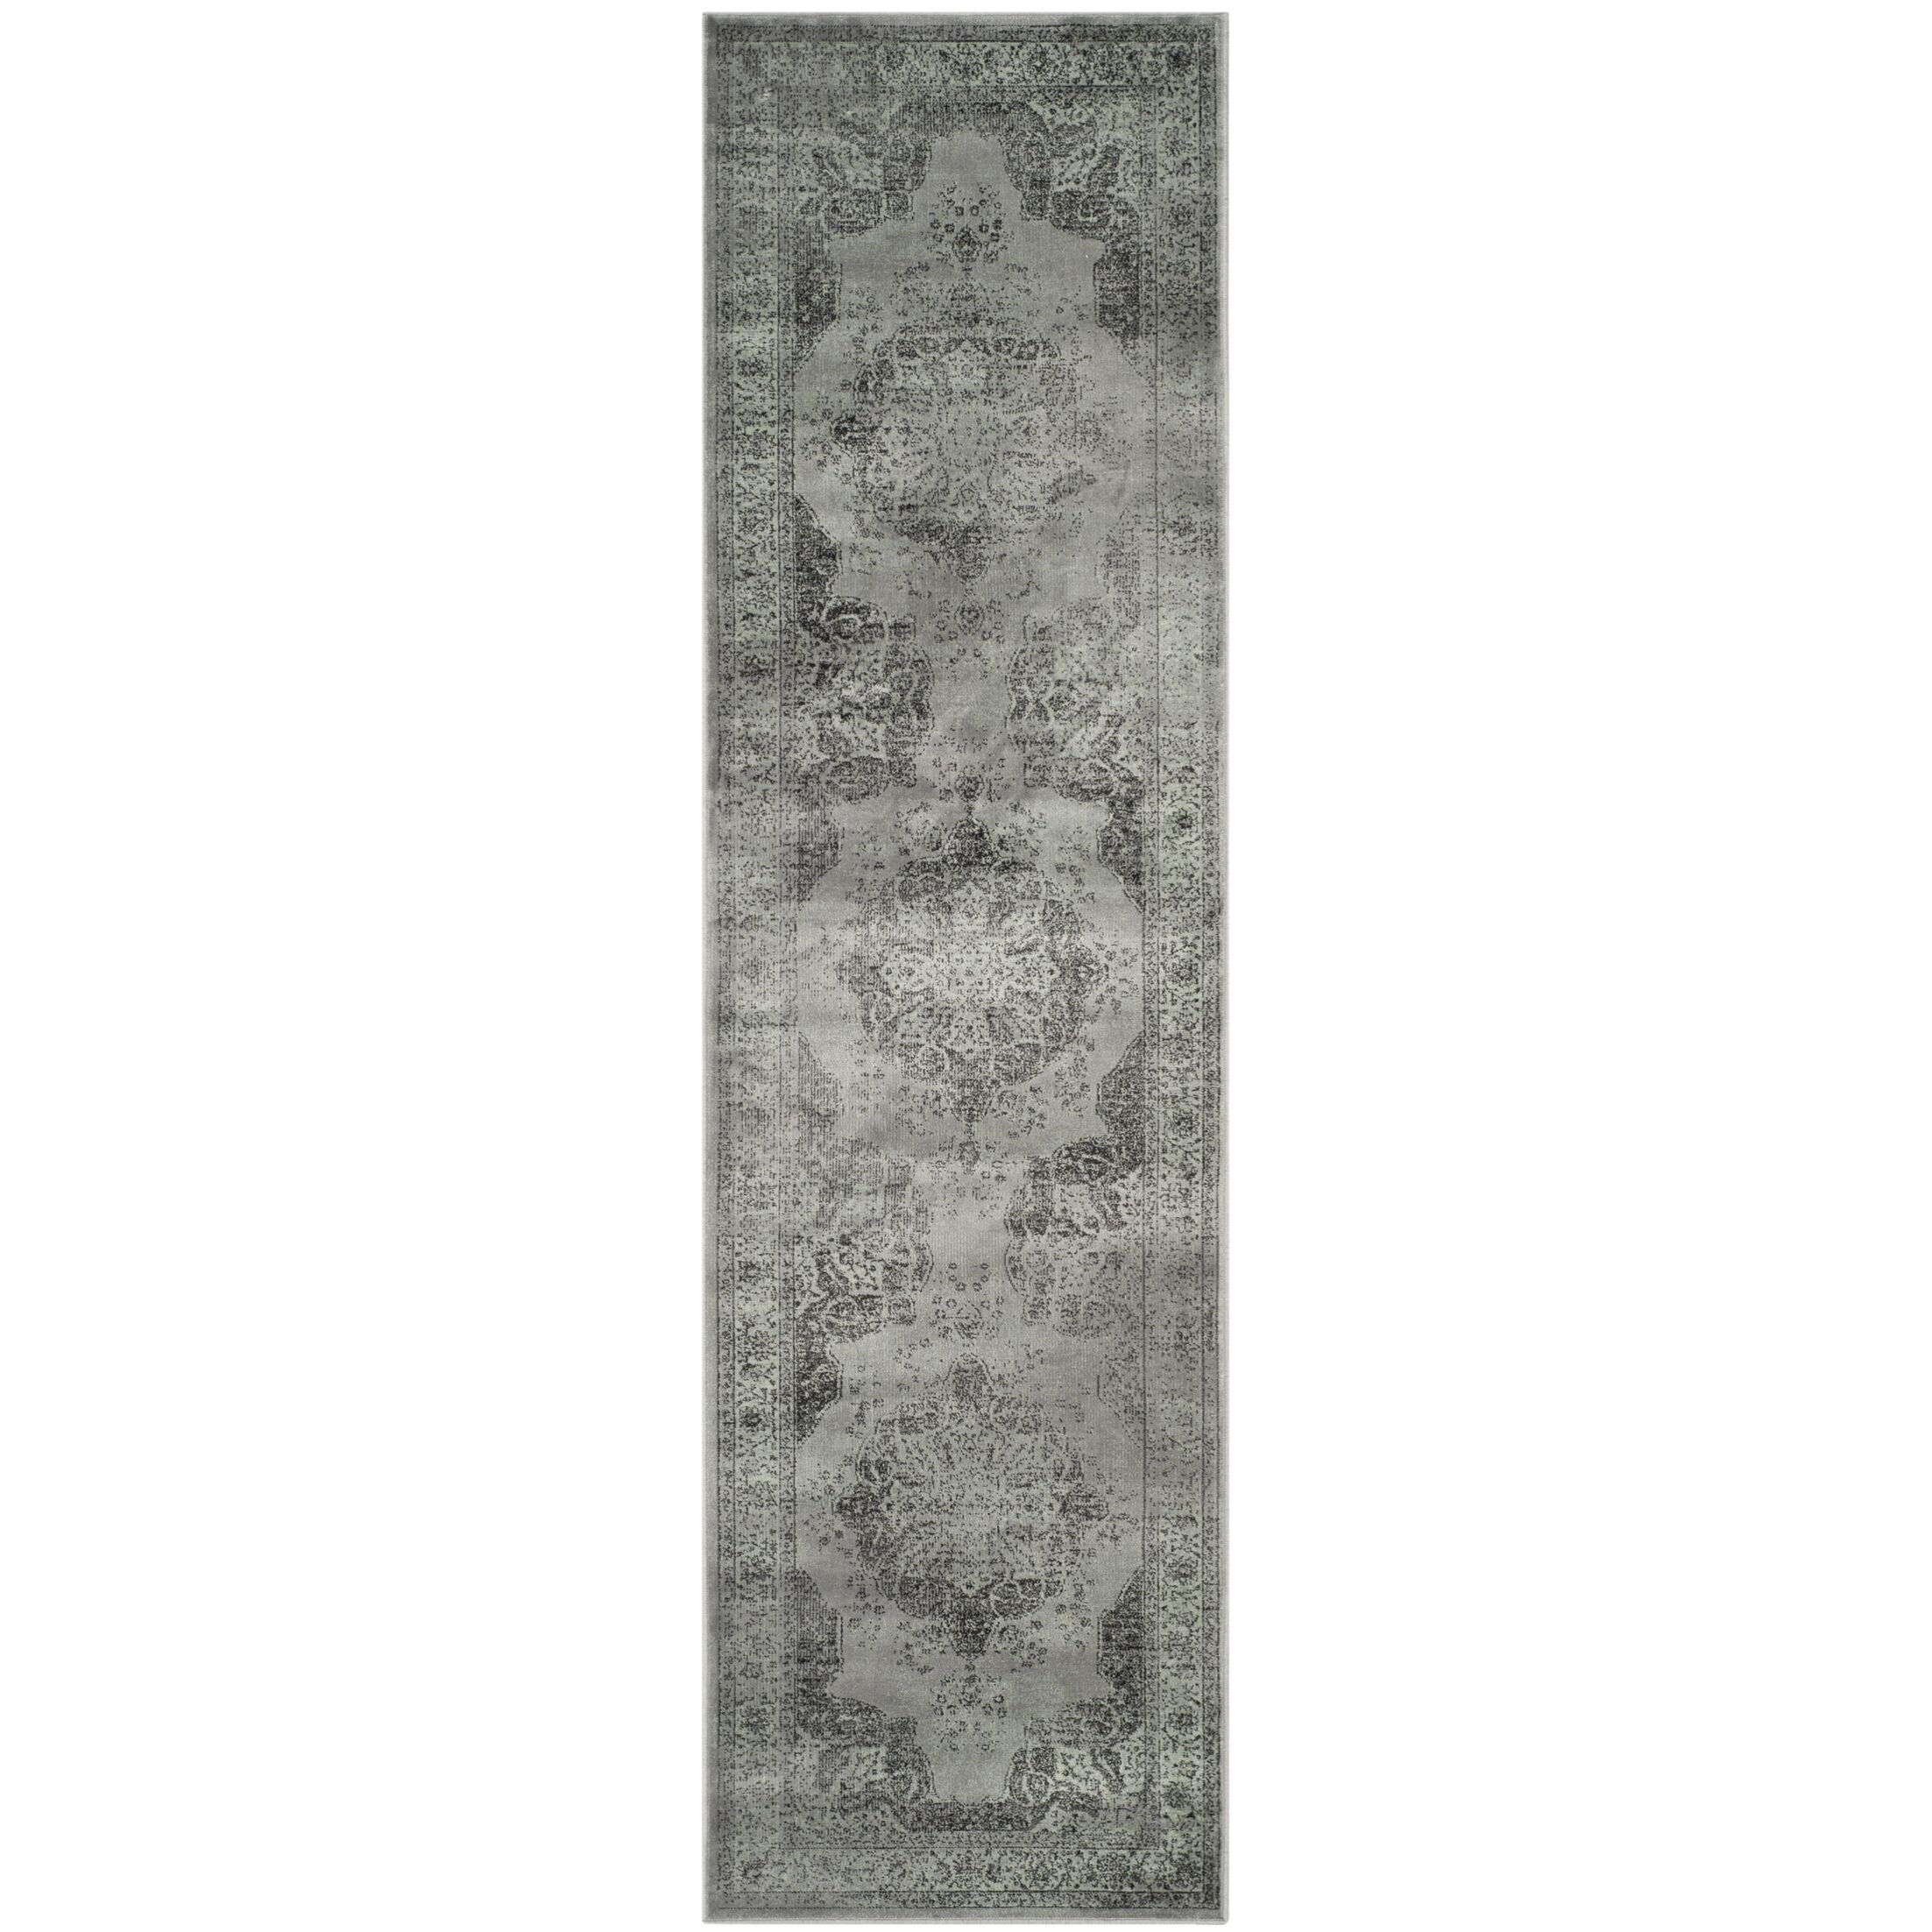 Makenna Gray/Green Area Rug Rug Size: Runner 2'2